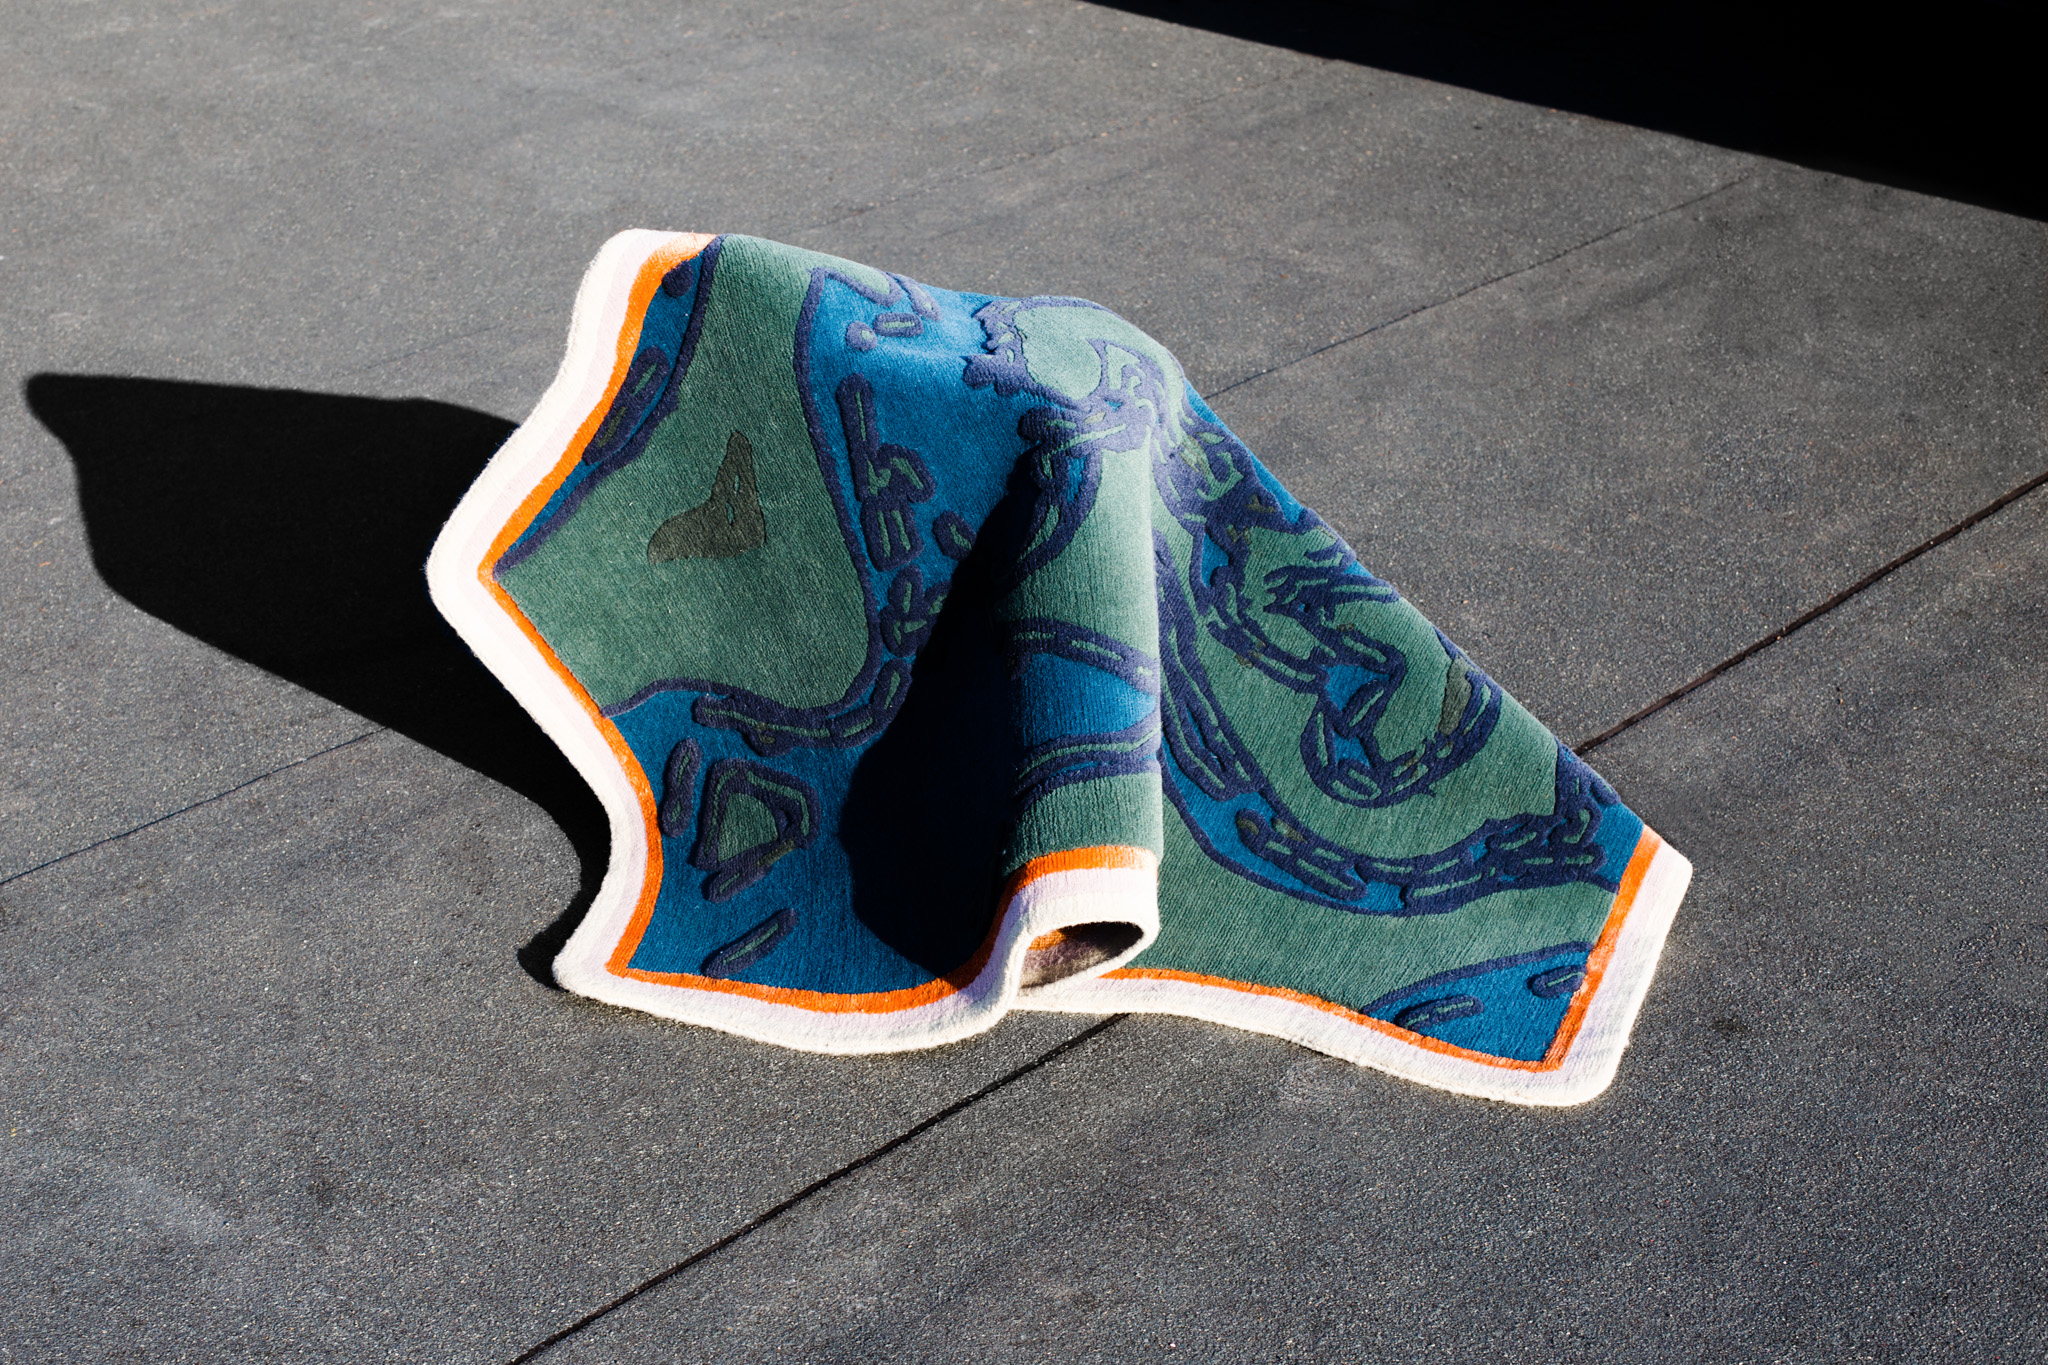 alan-tamir-t.a.z.-mania-rugs-2.jpg